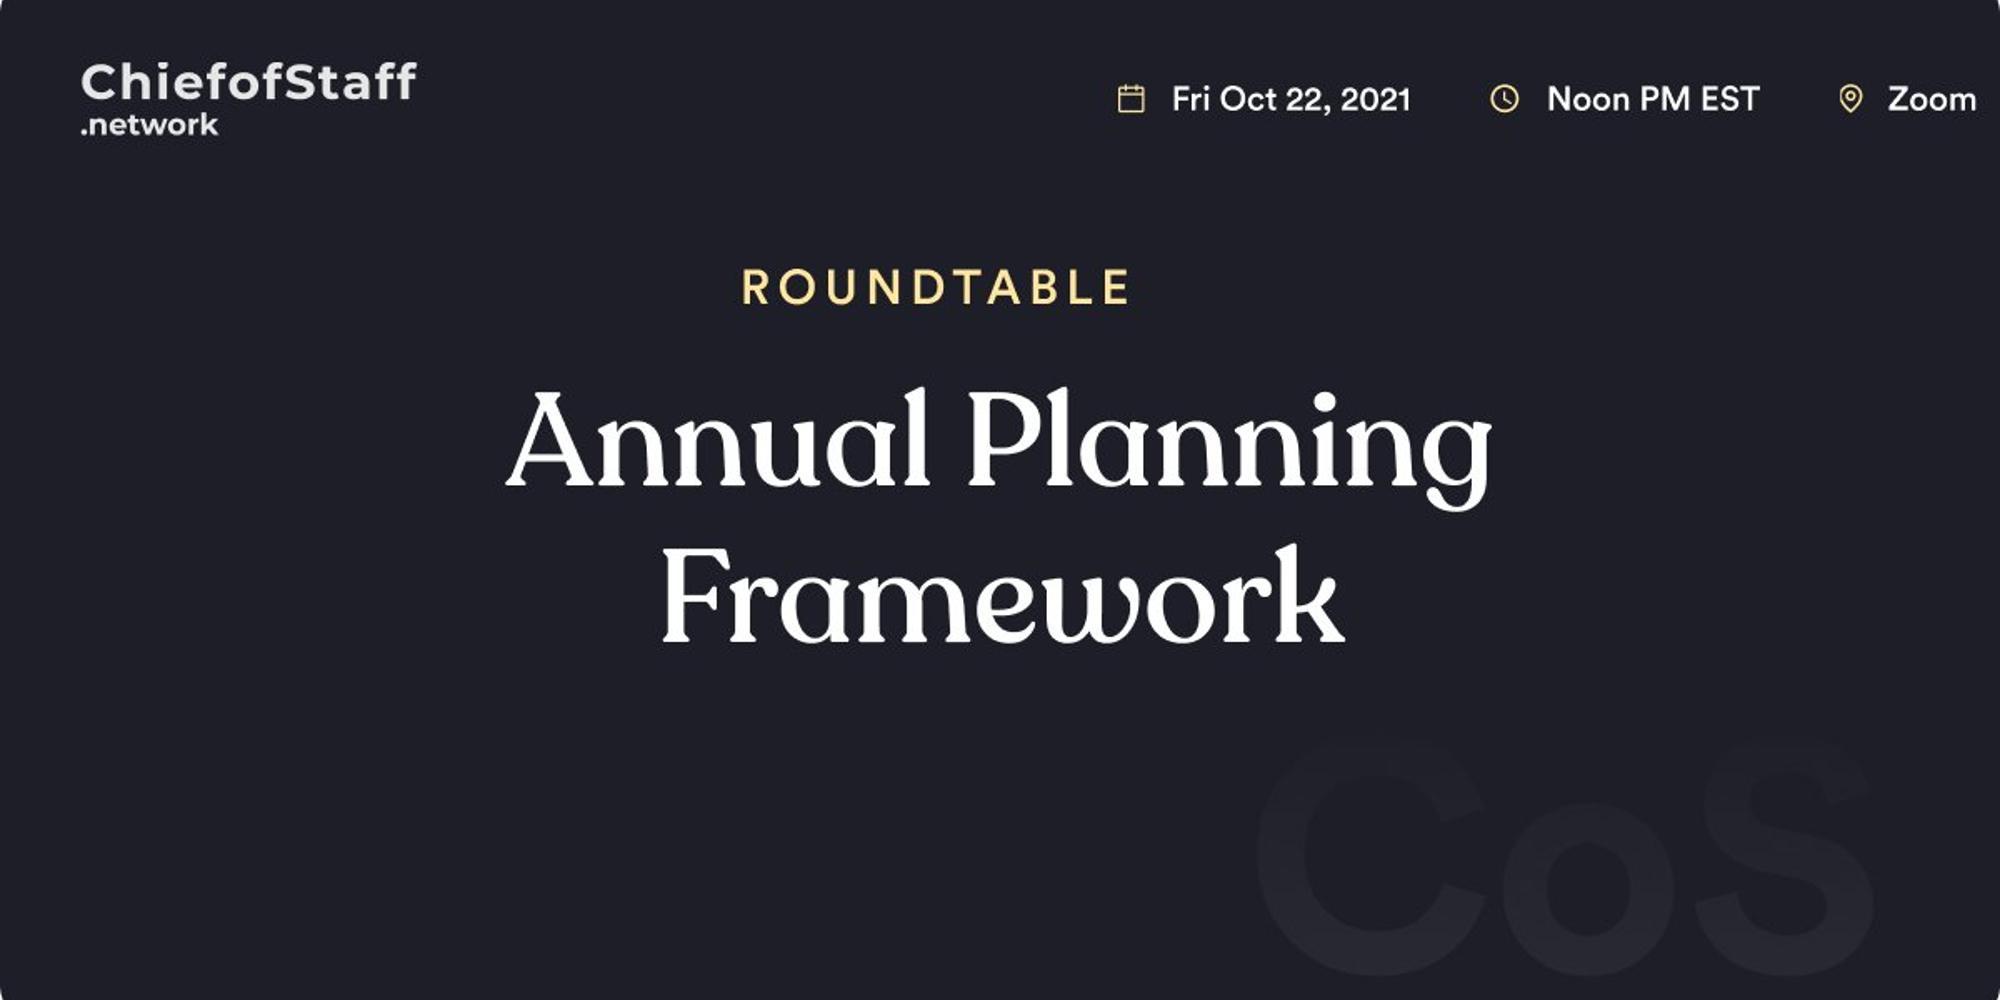 Annual Planning Framework Roundtable